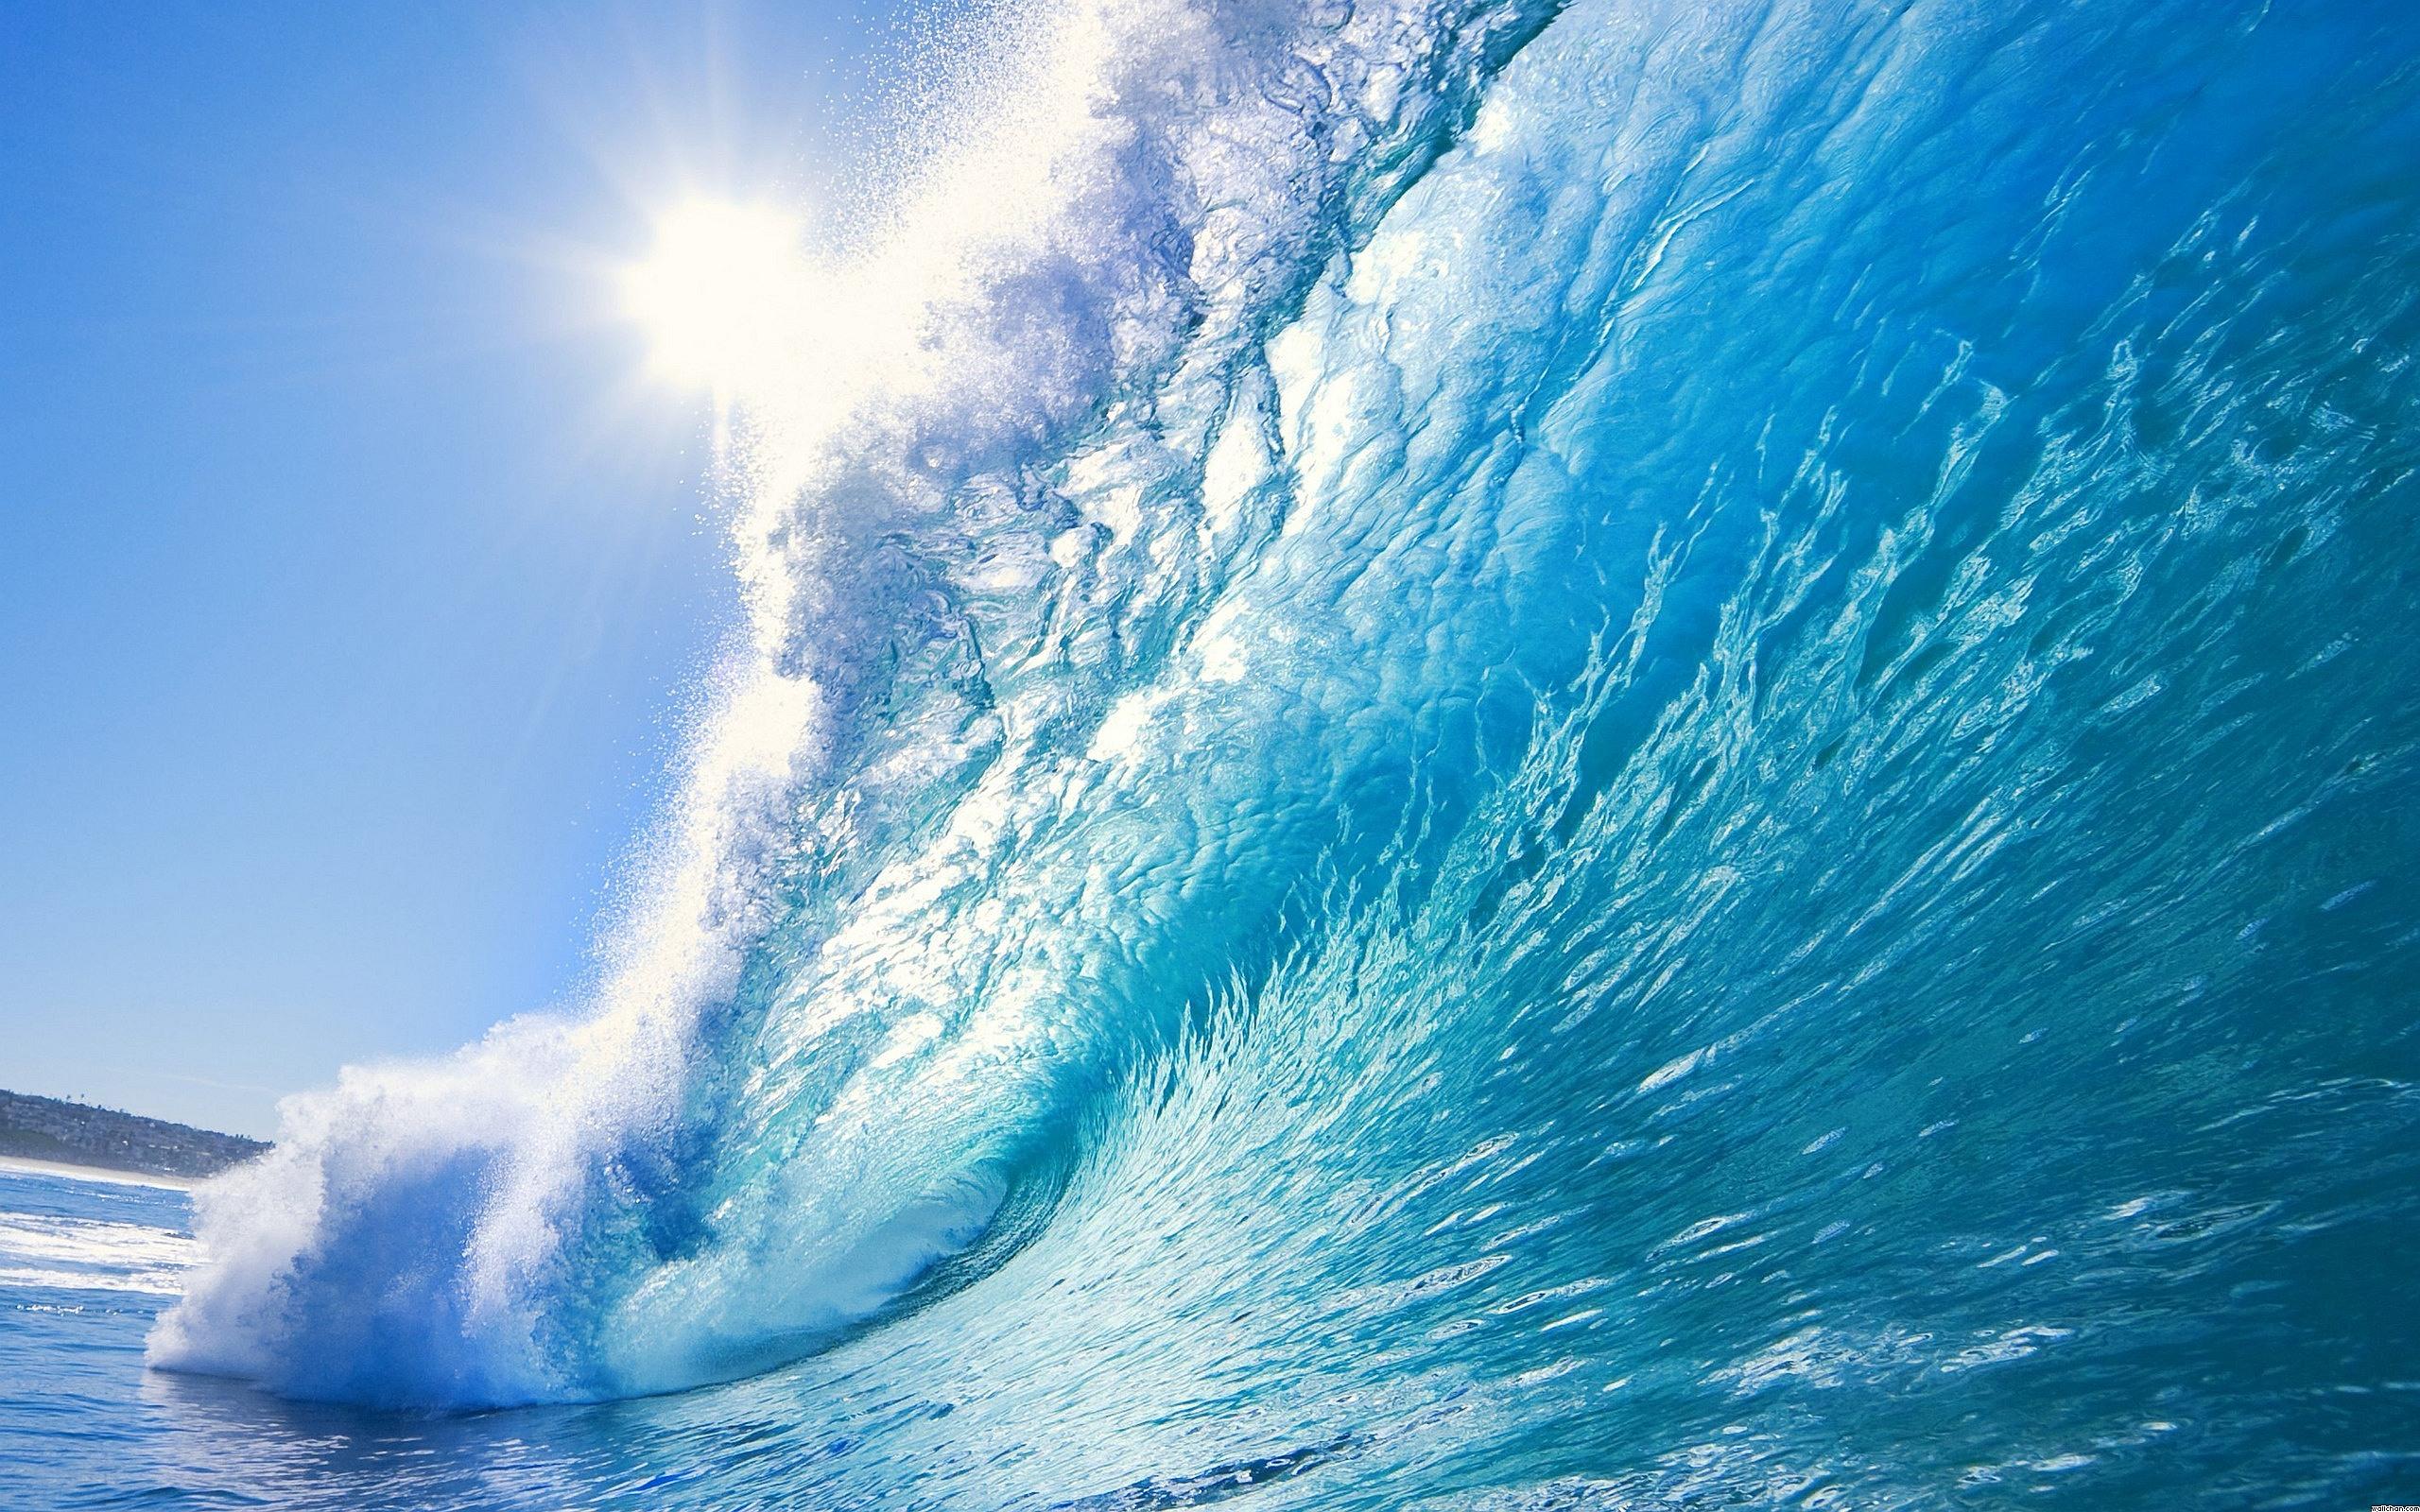 wave images hd